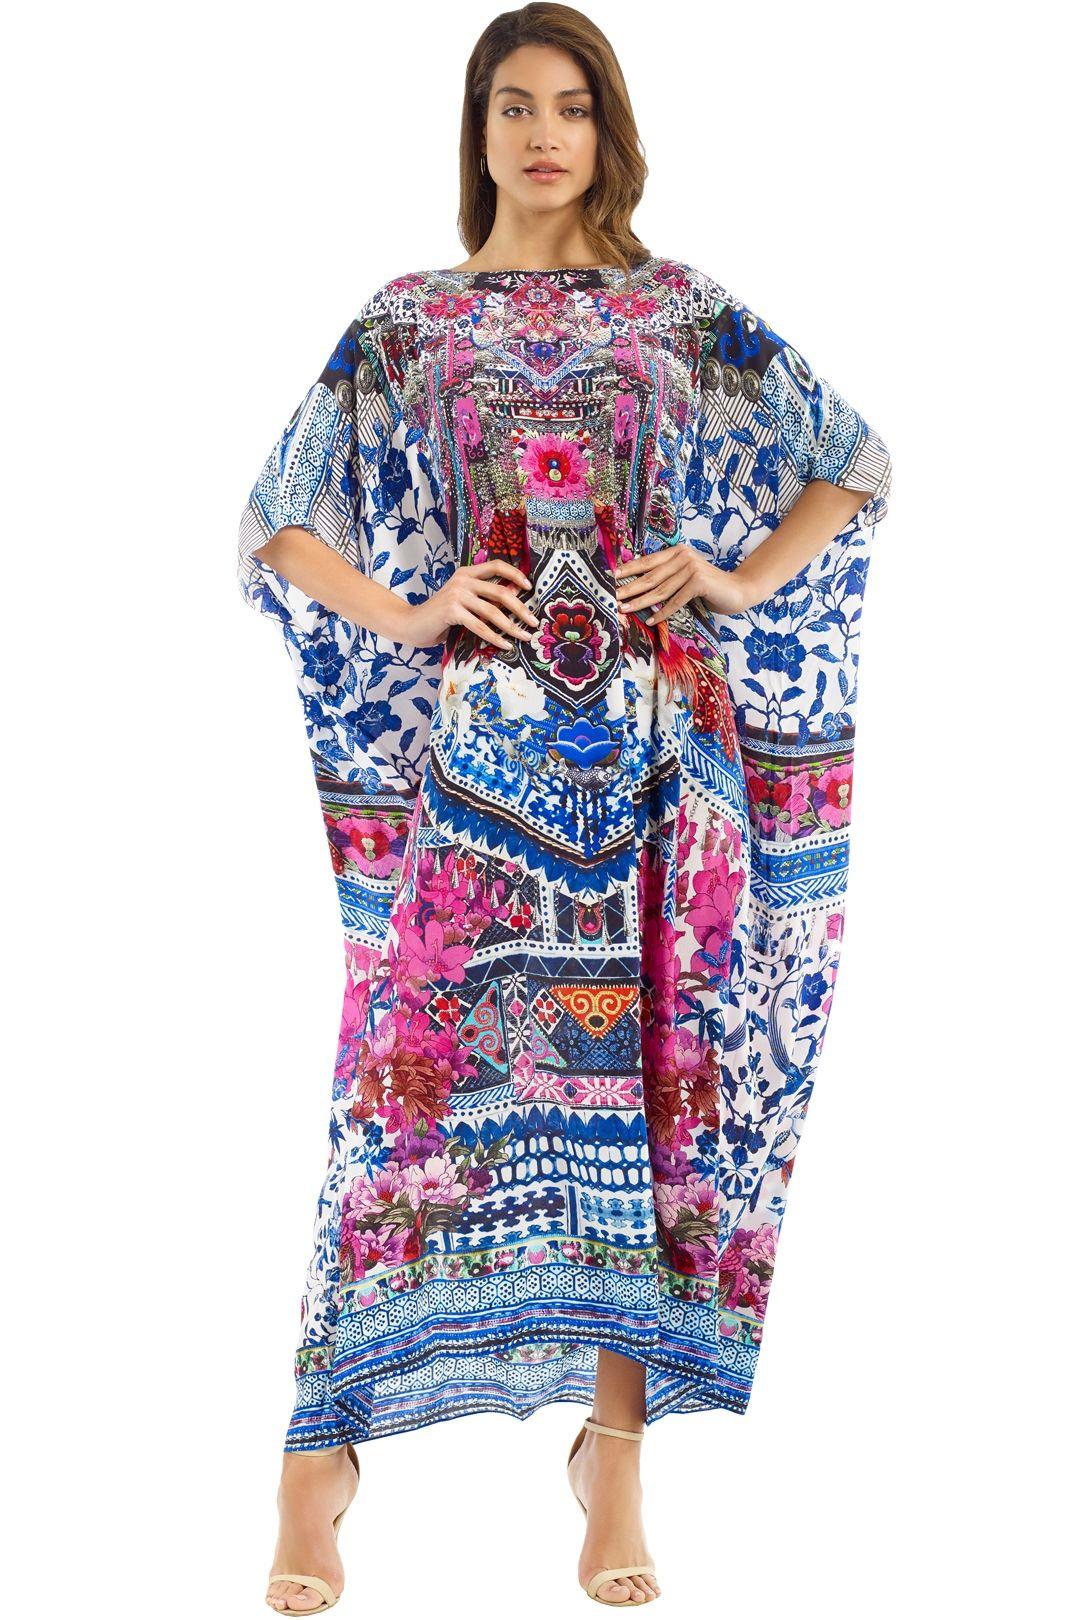 Camilla - Bohemian Paradise Kaftan - Blue - Front